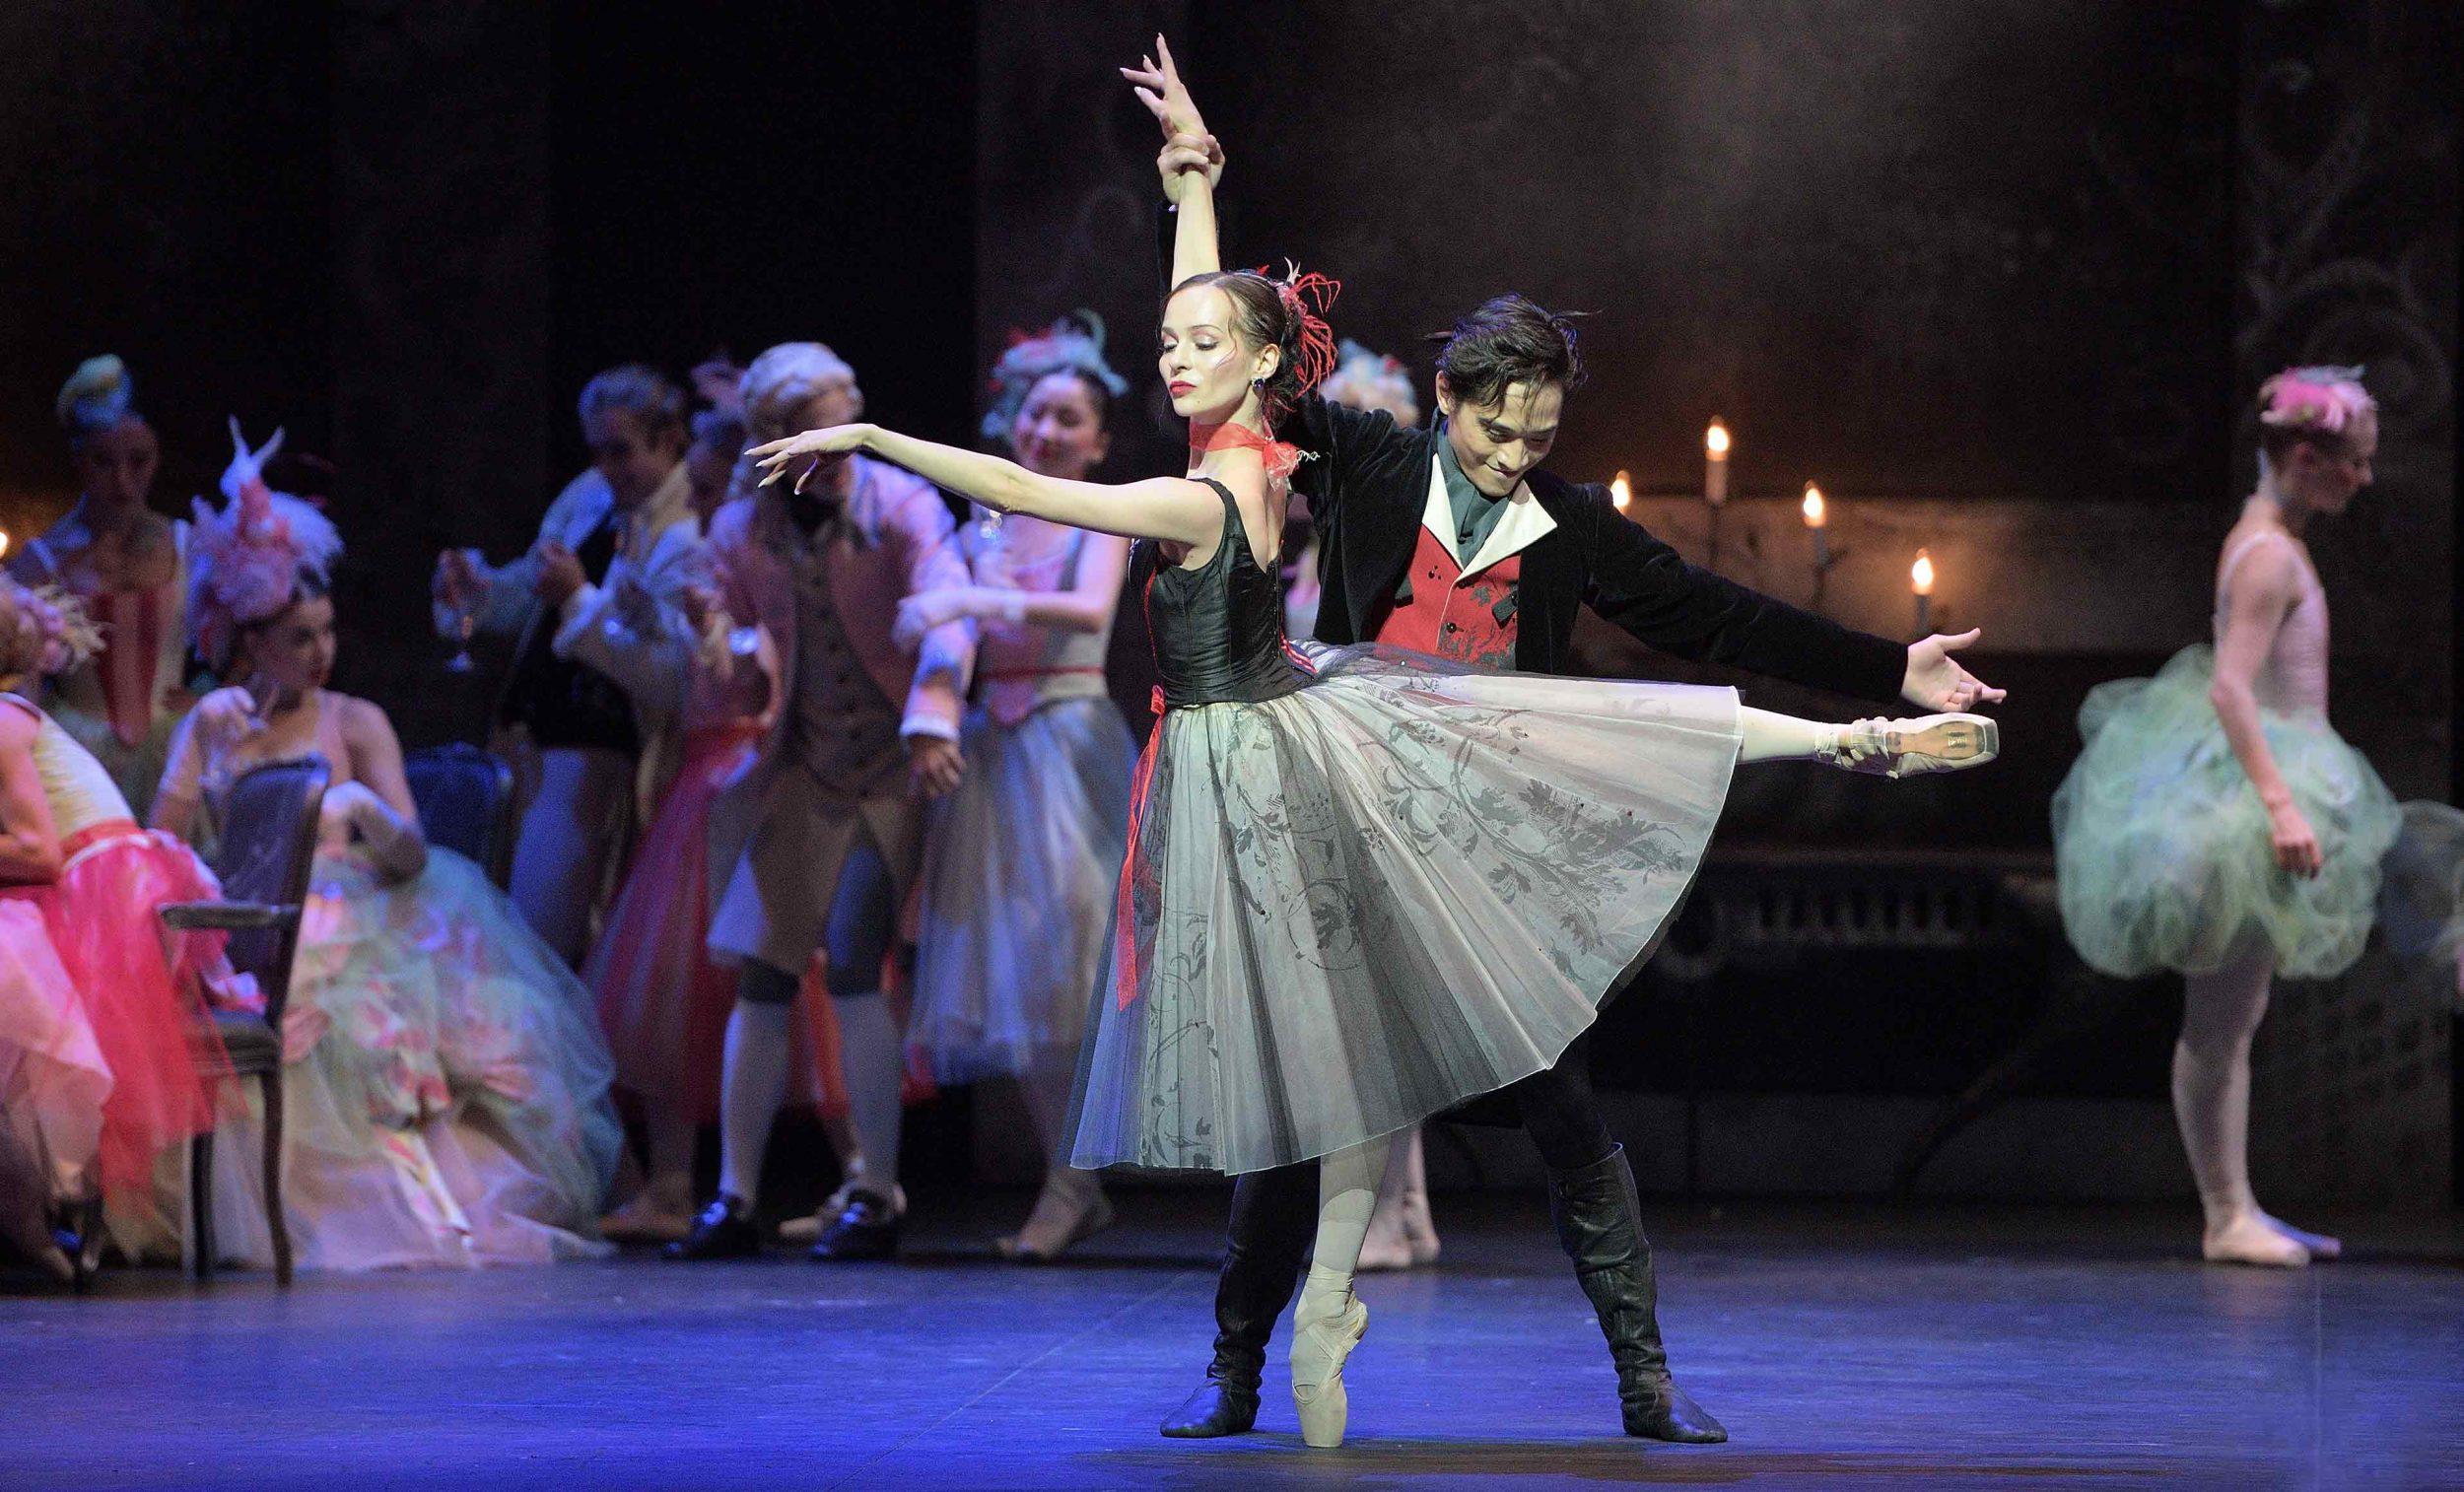 Katja-Khaniukova-and-Jeffrey-Cirio-in-Manon-(c)-Laurent-Liotardo_WEB